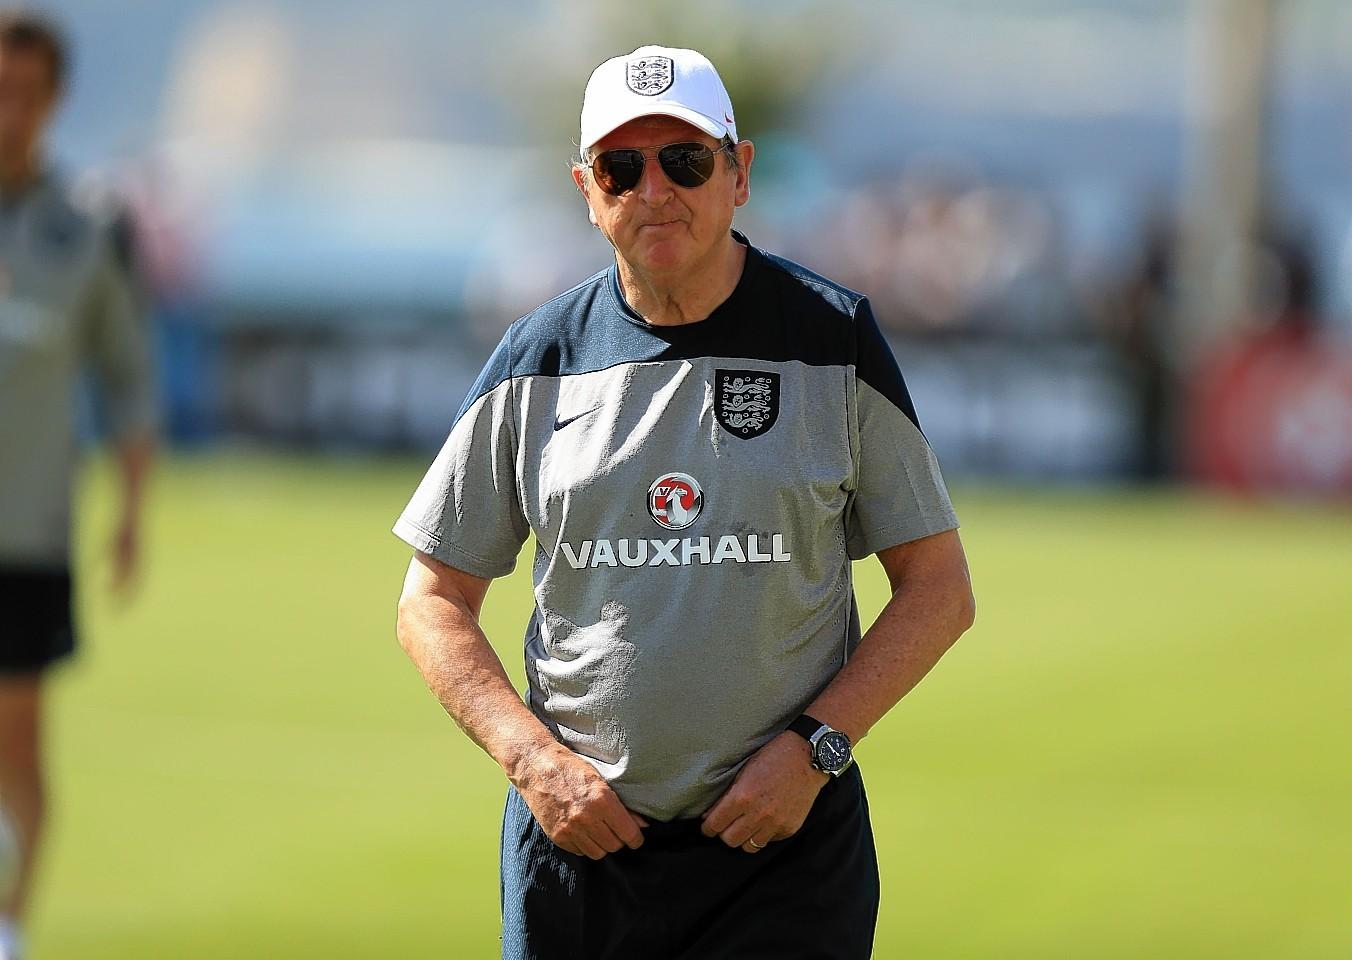 Gordon Brown has said he's backing Roy Hodgson's England team